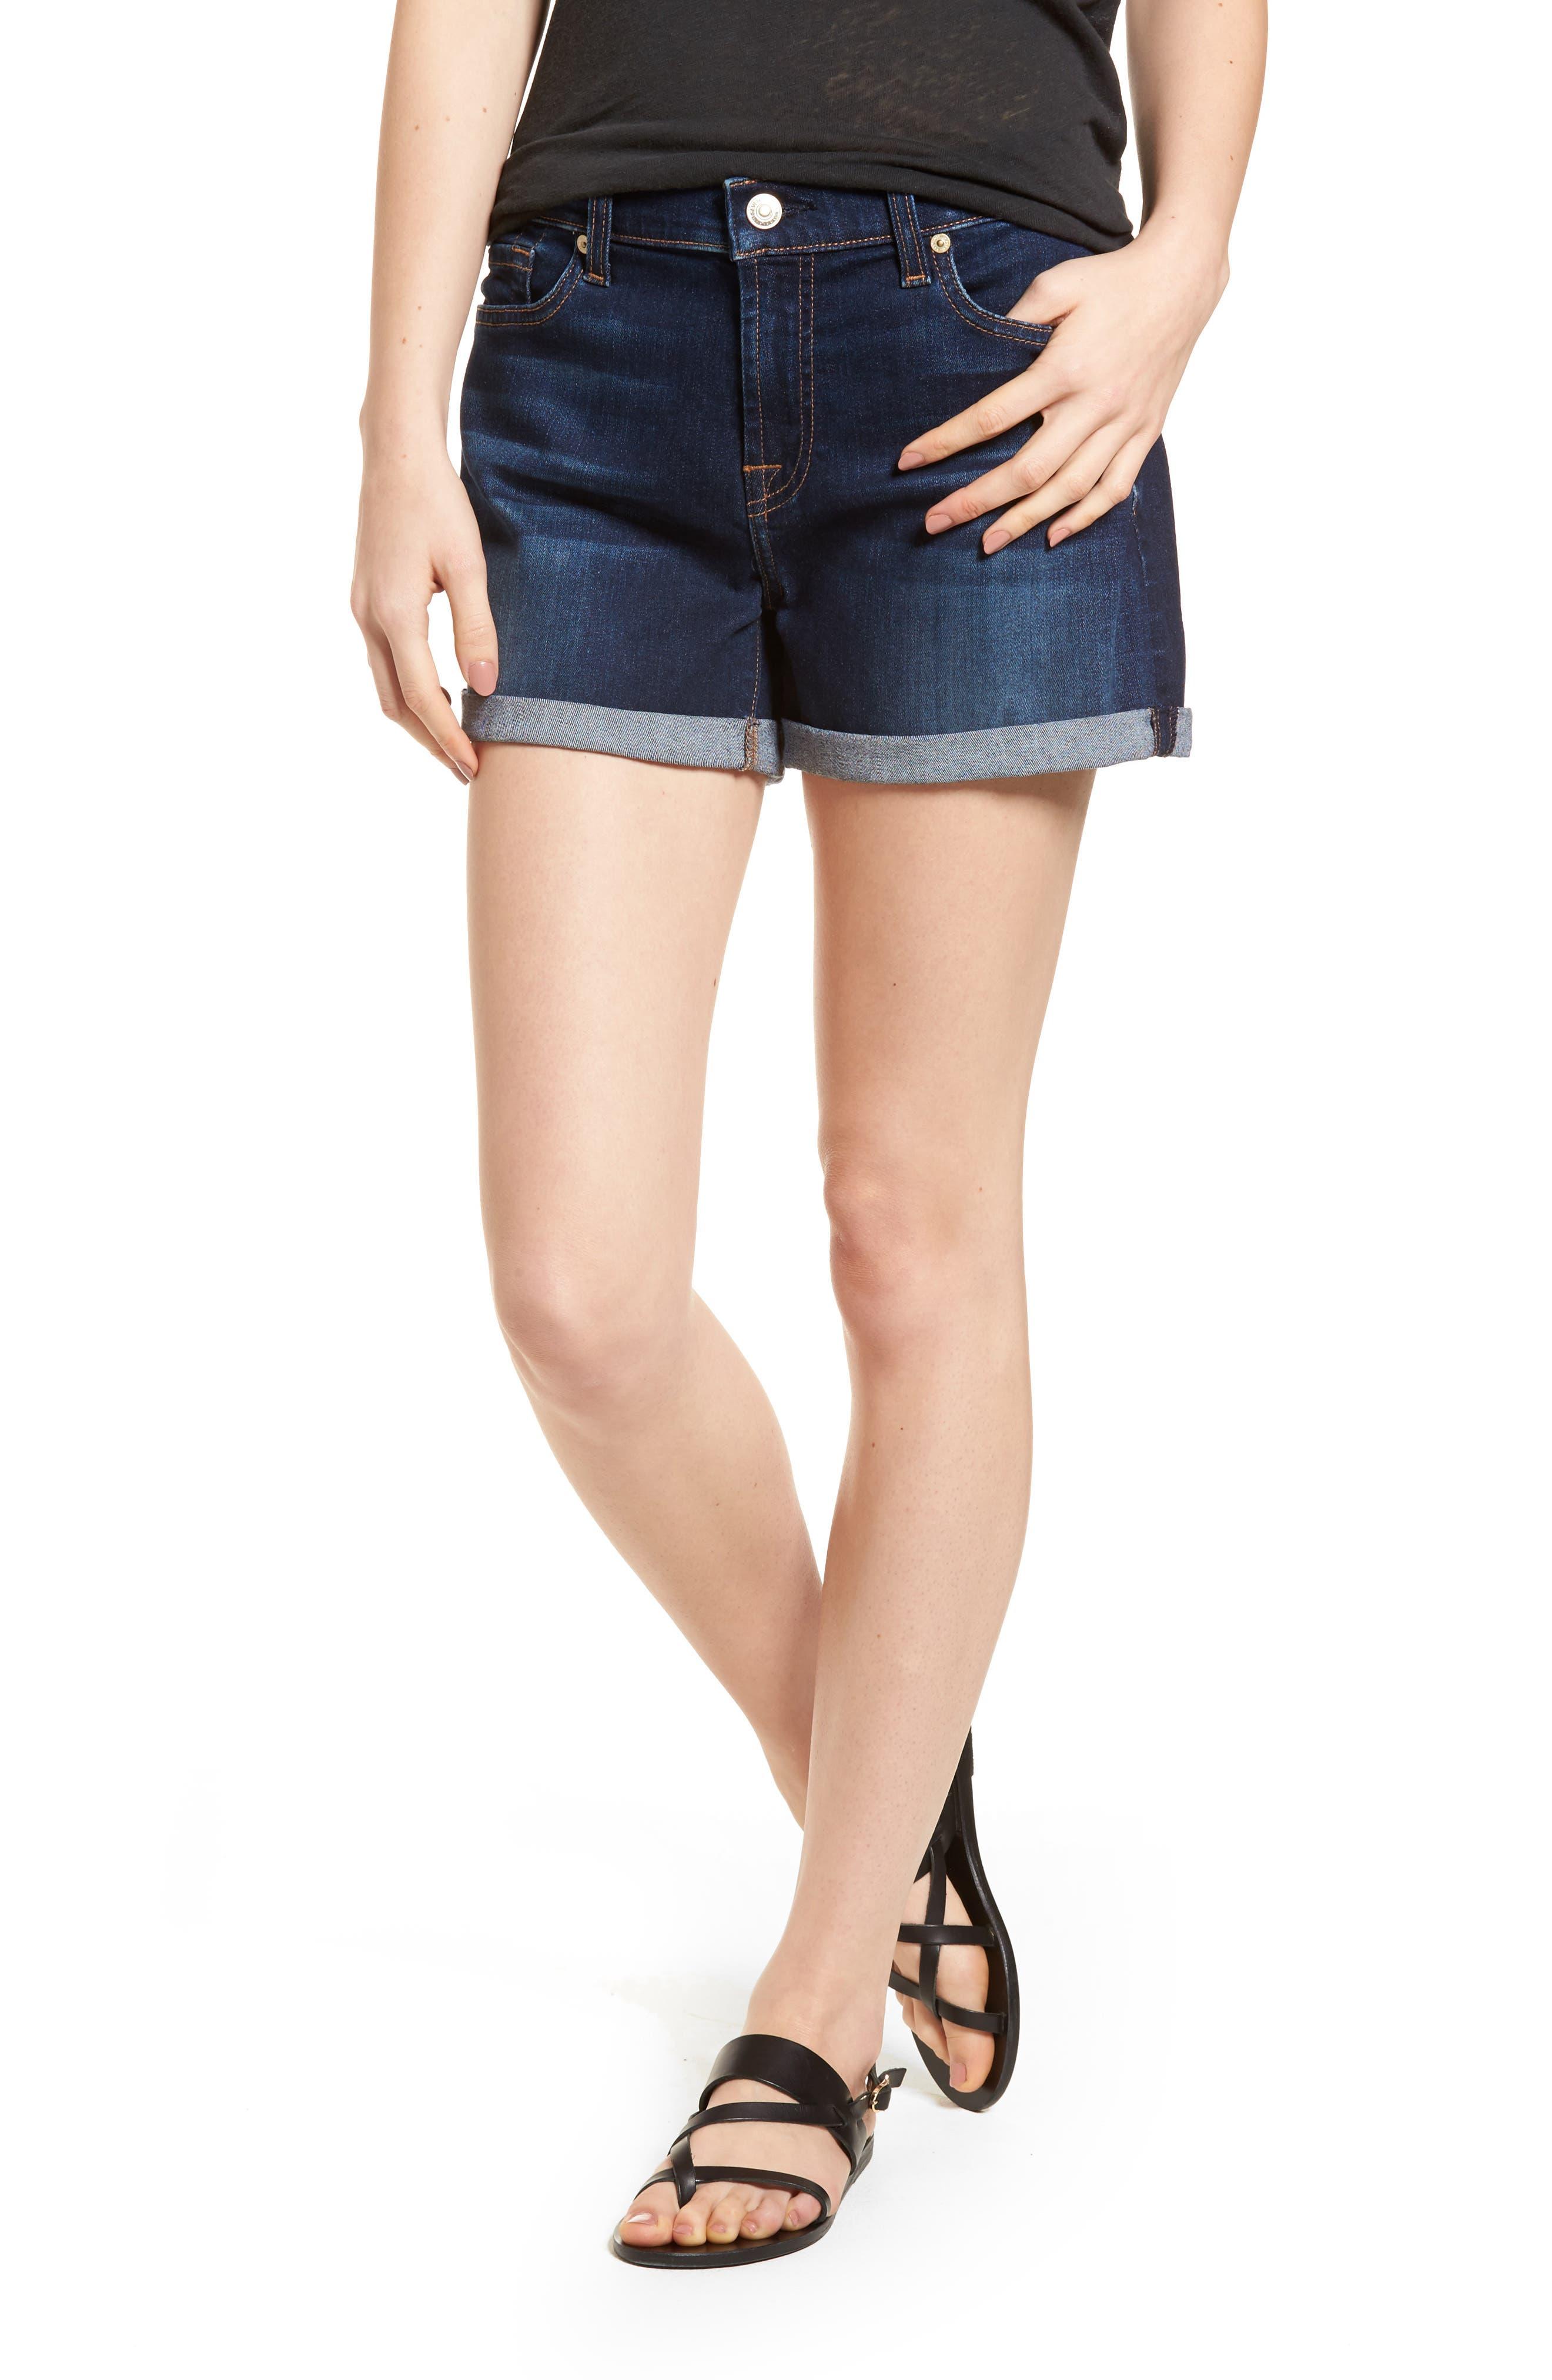 Women's 7 For All Mankind B(Air) Cuffed Denim Shorts